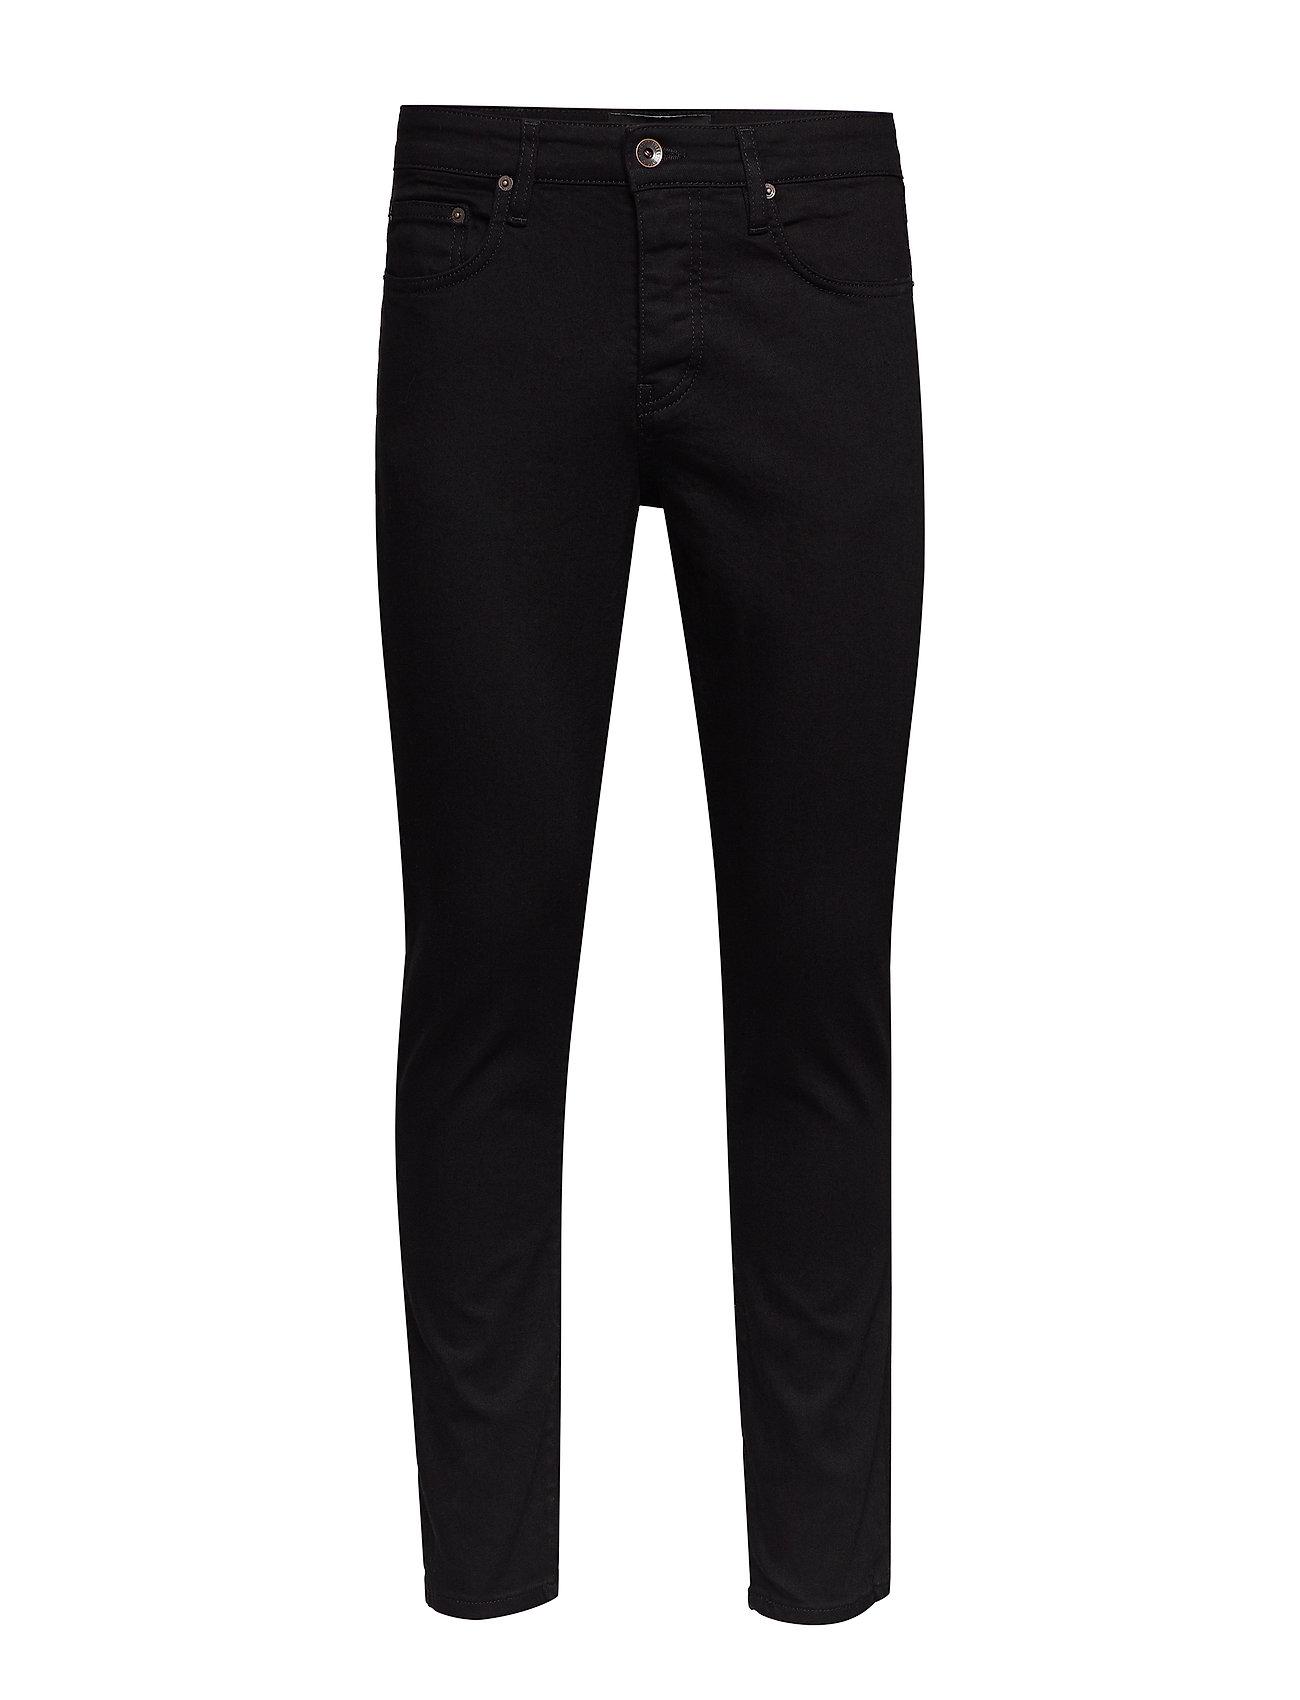 Image of Slim Fit Jean Slim Jeans Sort Lyle & Scott (3323464227)